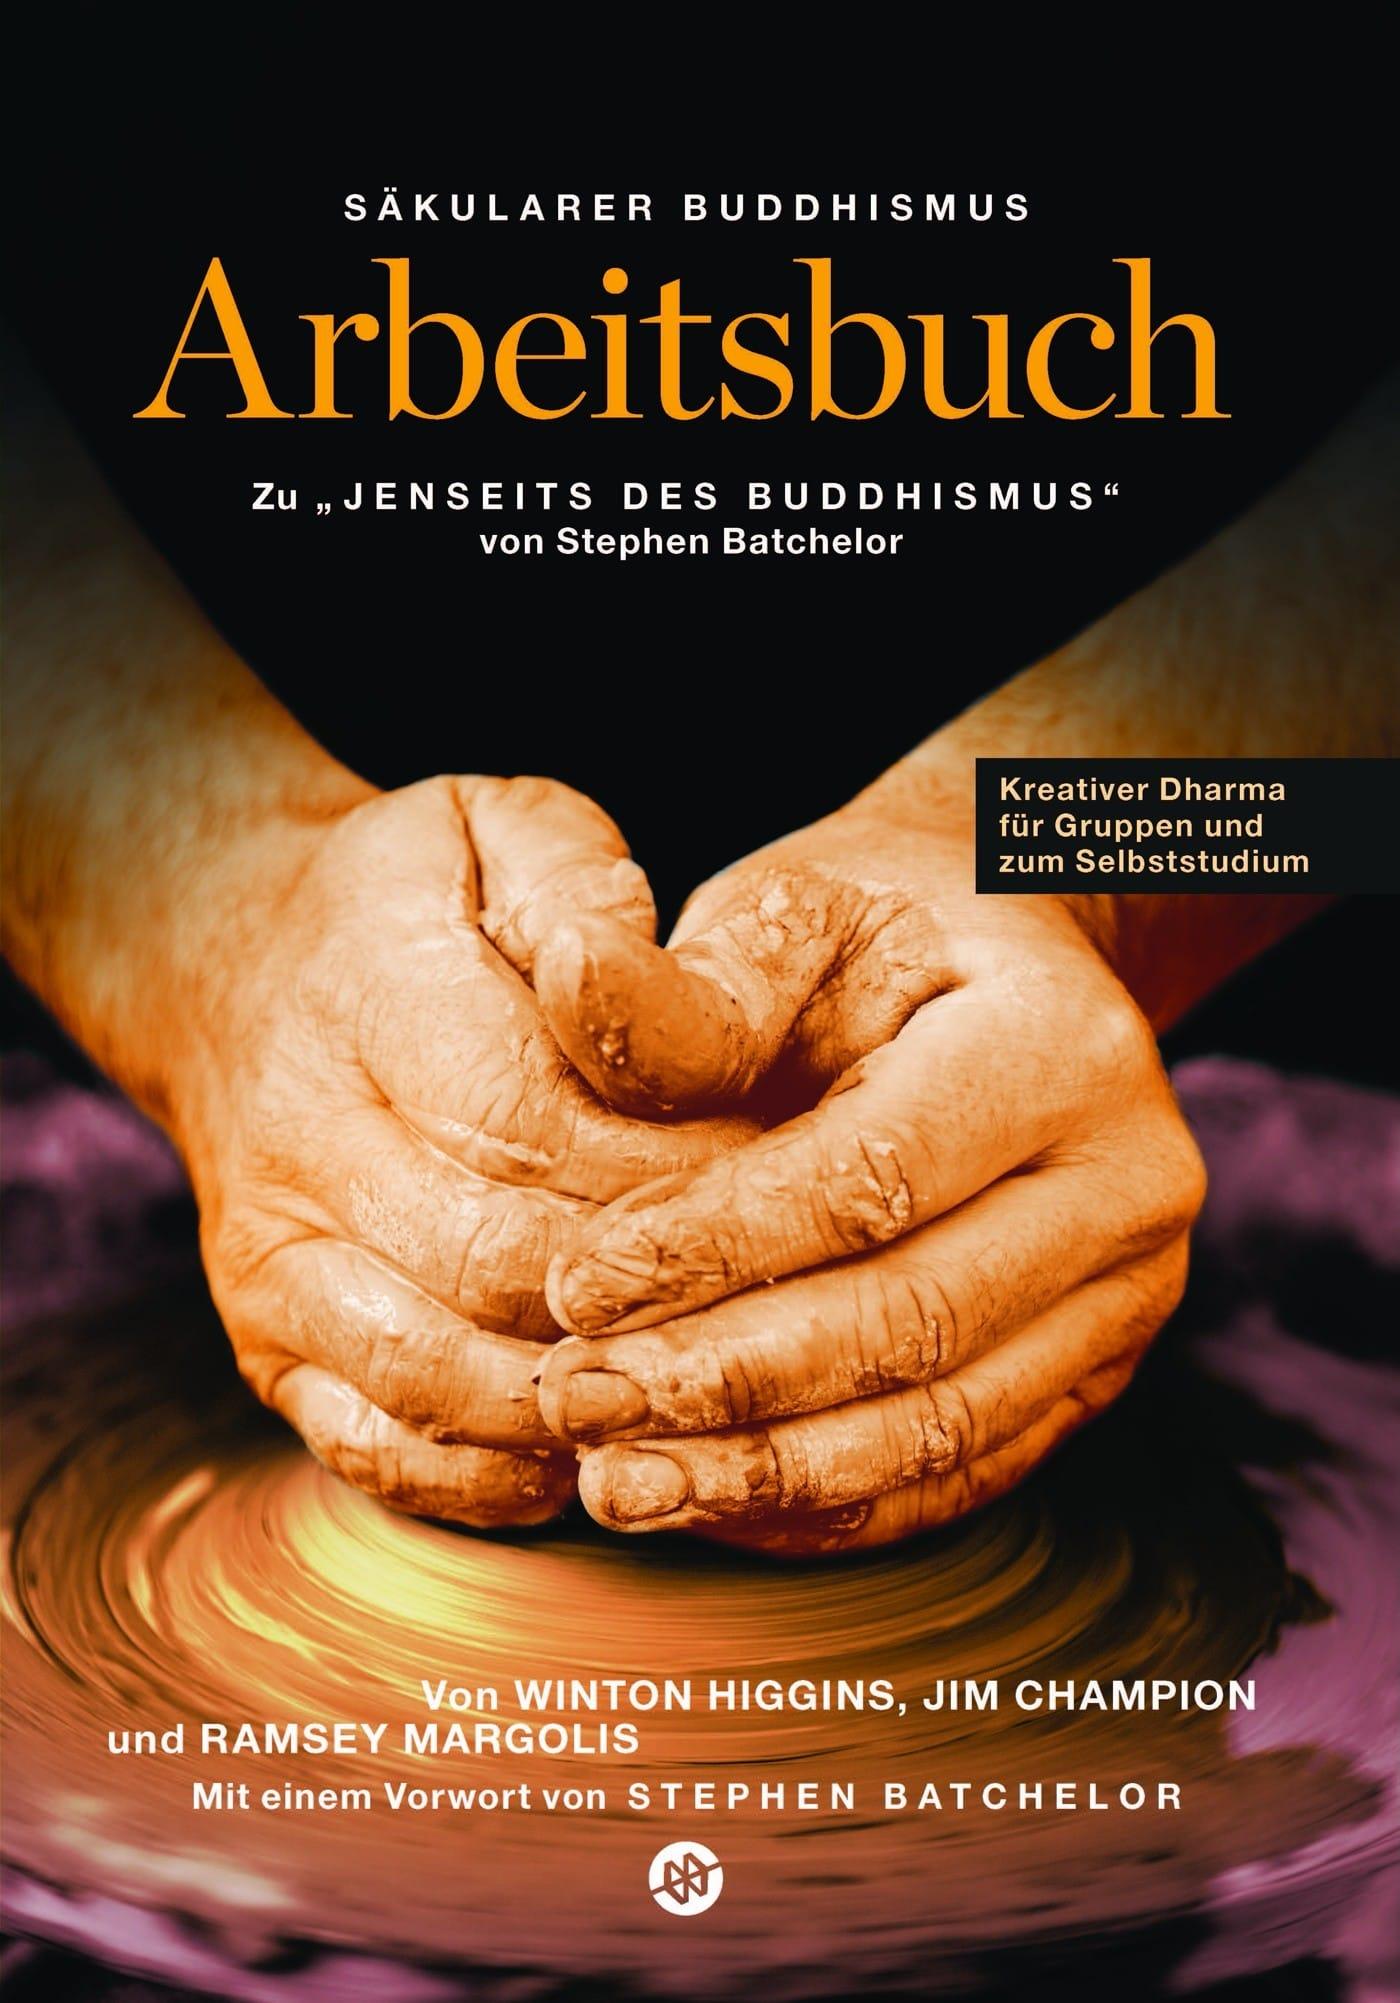 arbeitsbuch säkularer buddhismus cover